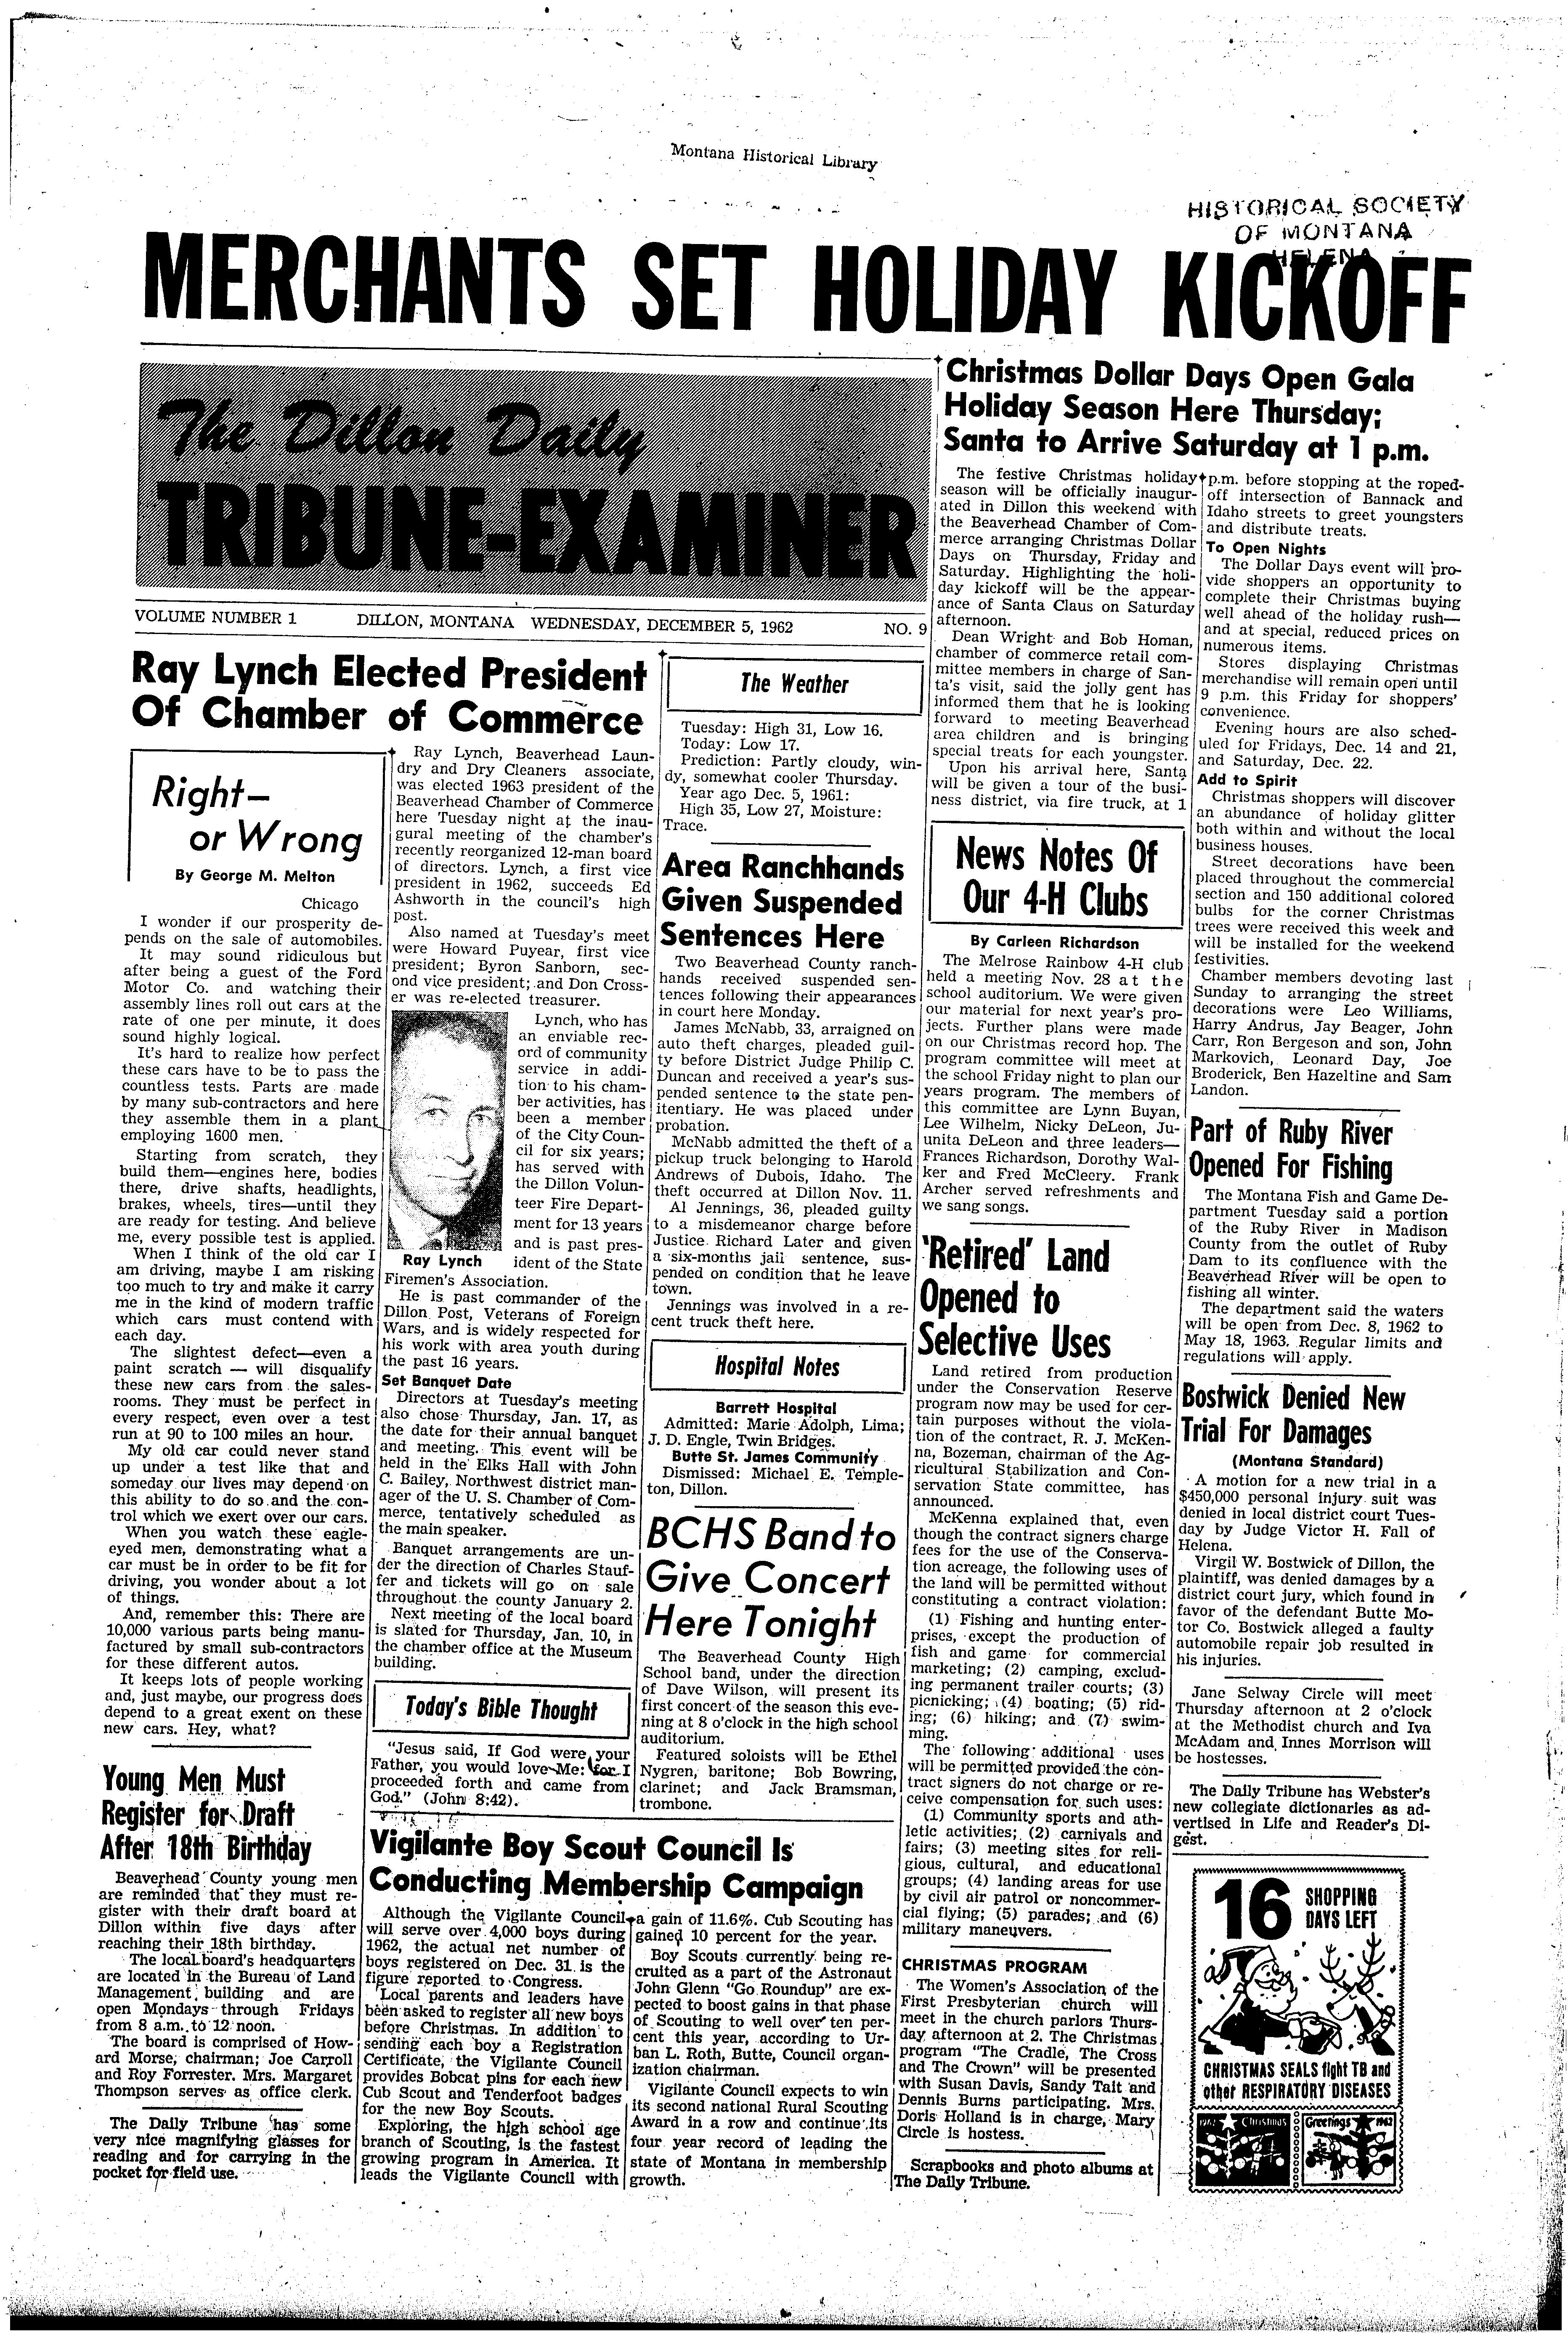 The Dillon Daily Tribune-Examiner (Dillon, Mont.) 1962-1971 ...